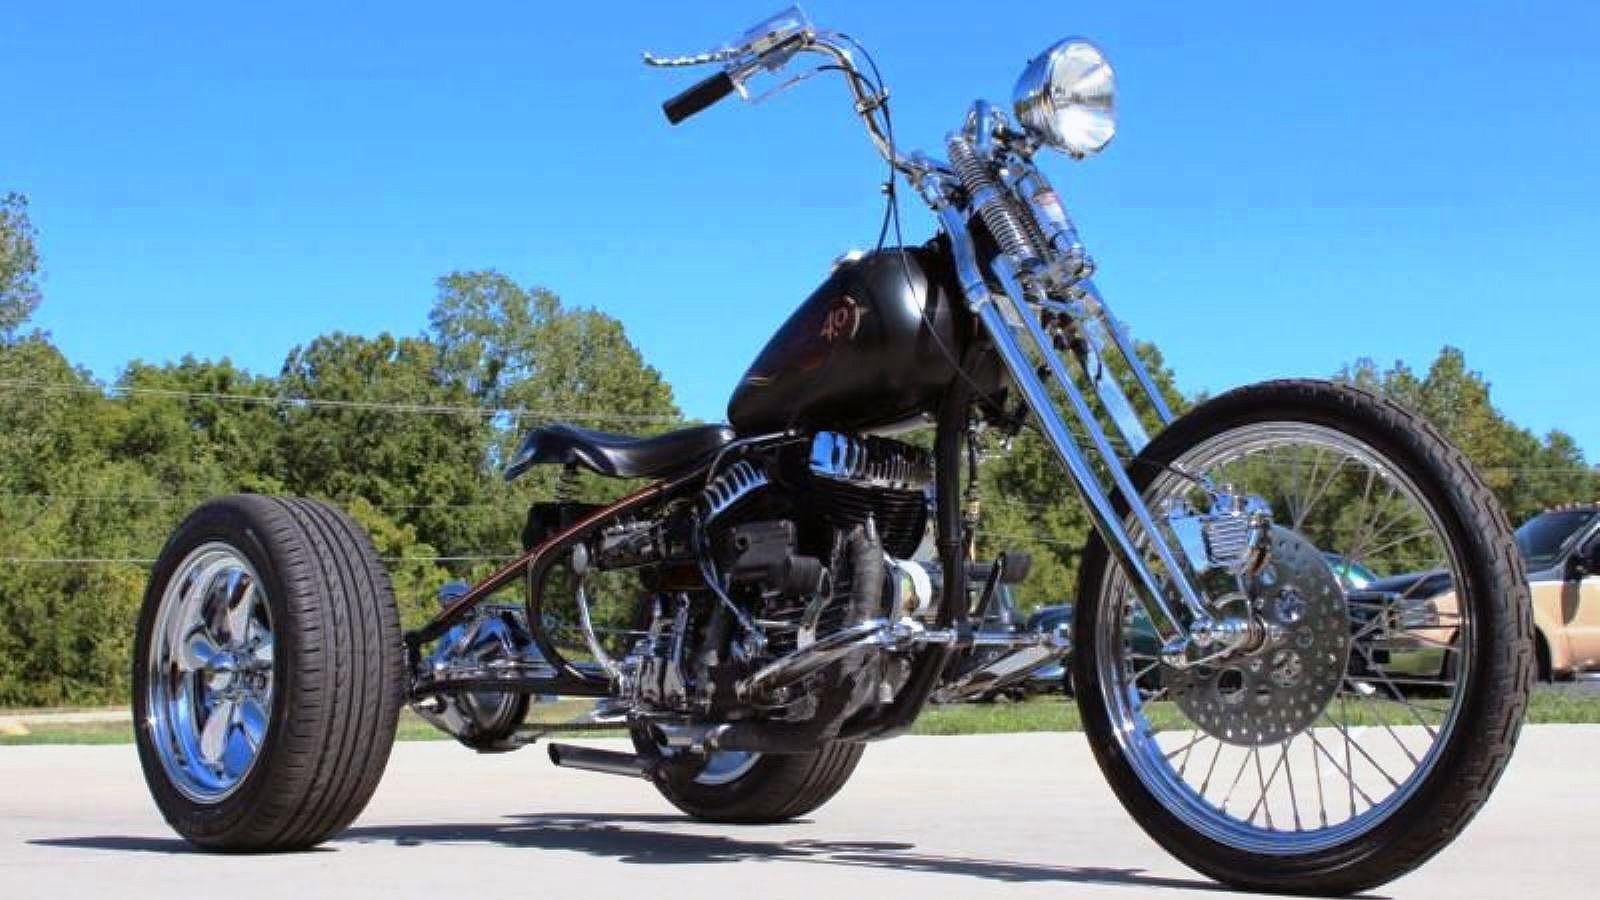 Harley Davidson: The Hard Working Harley-Davidson Servi-Car Of 1932-1973